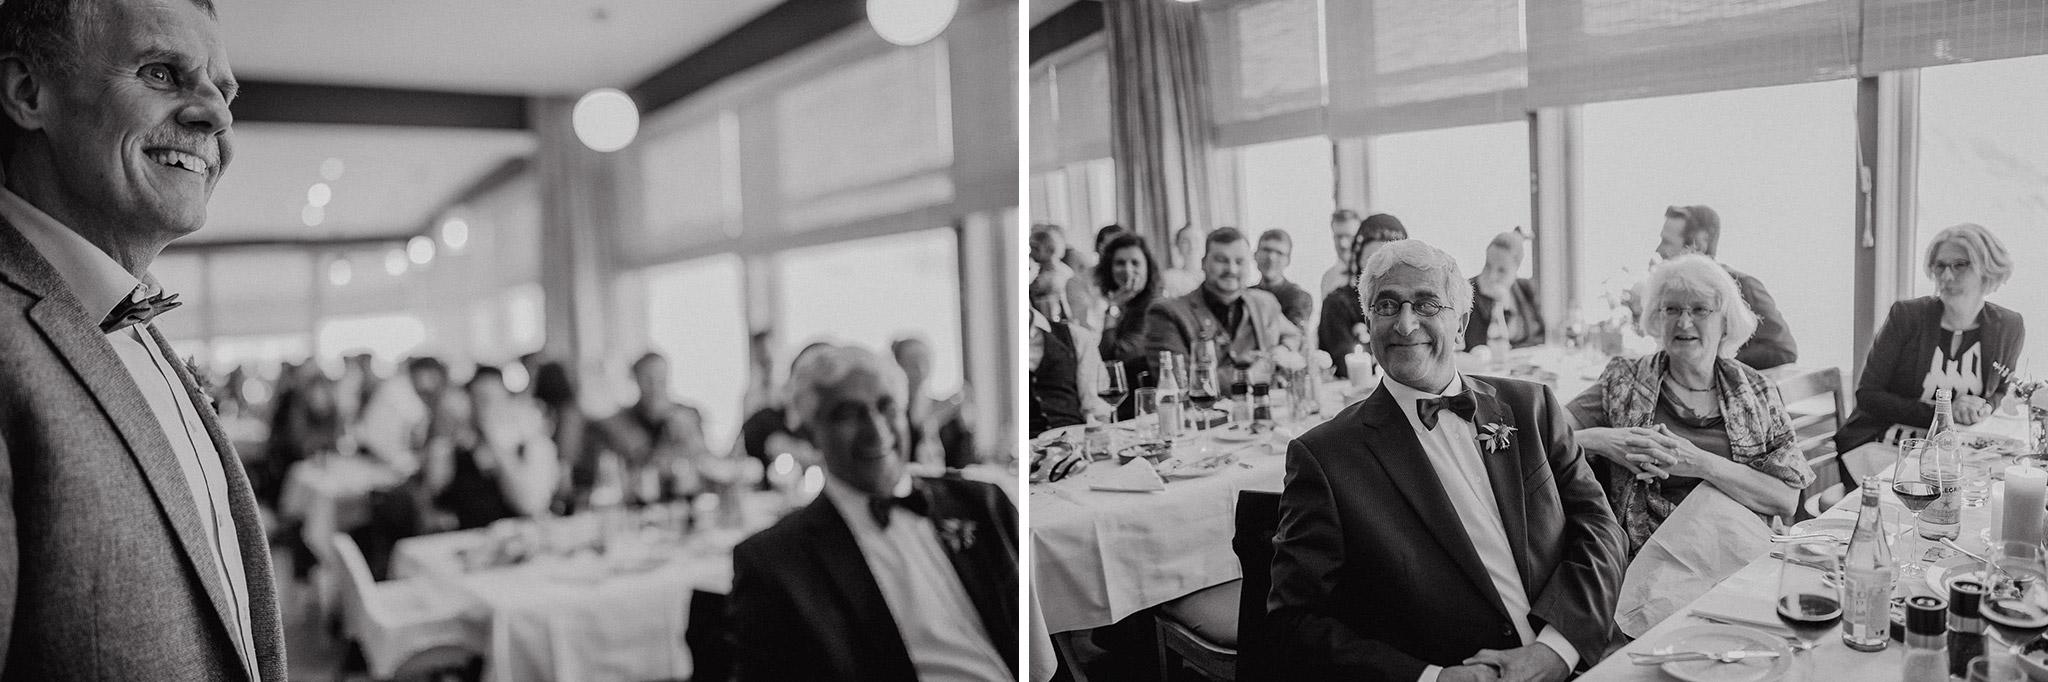 Hochzeitsfotograf_Amrum_Sylt_238